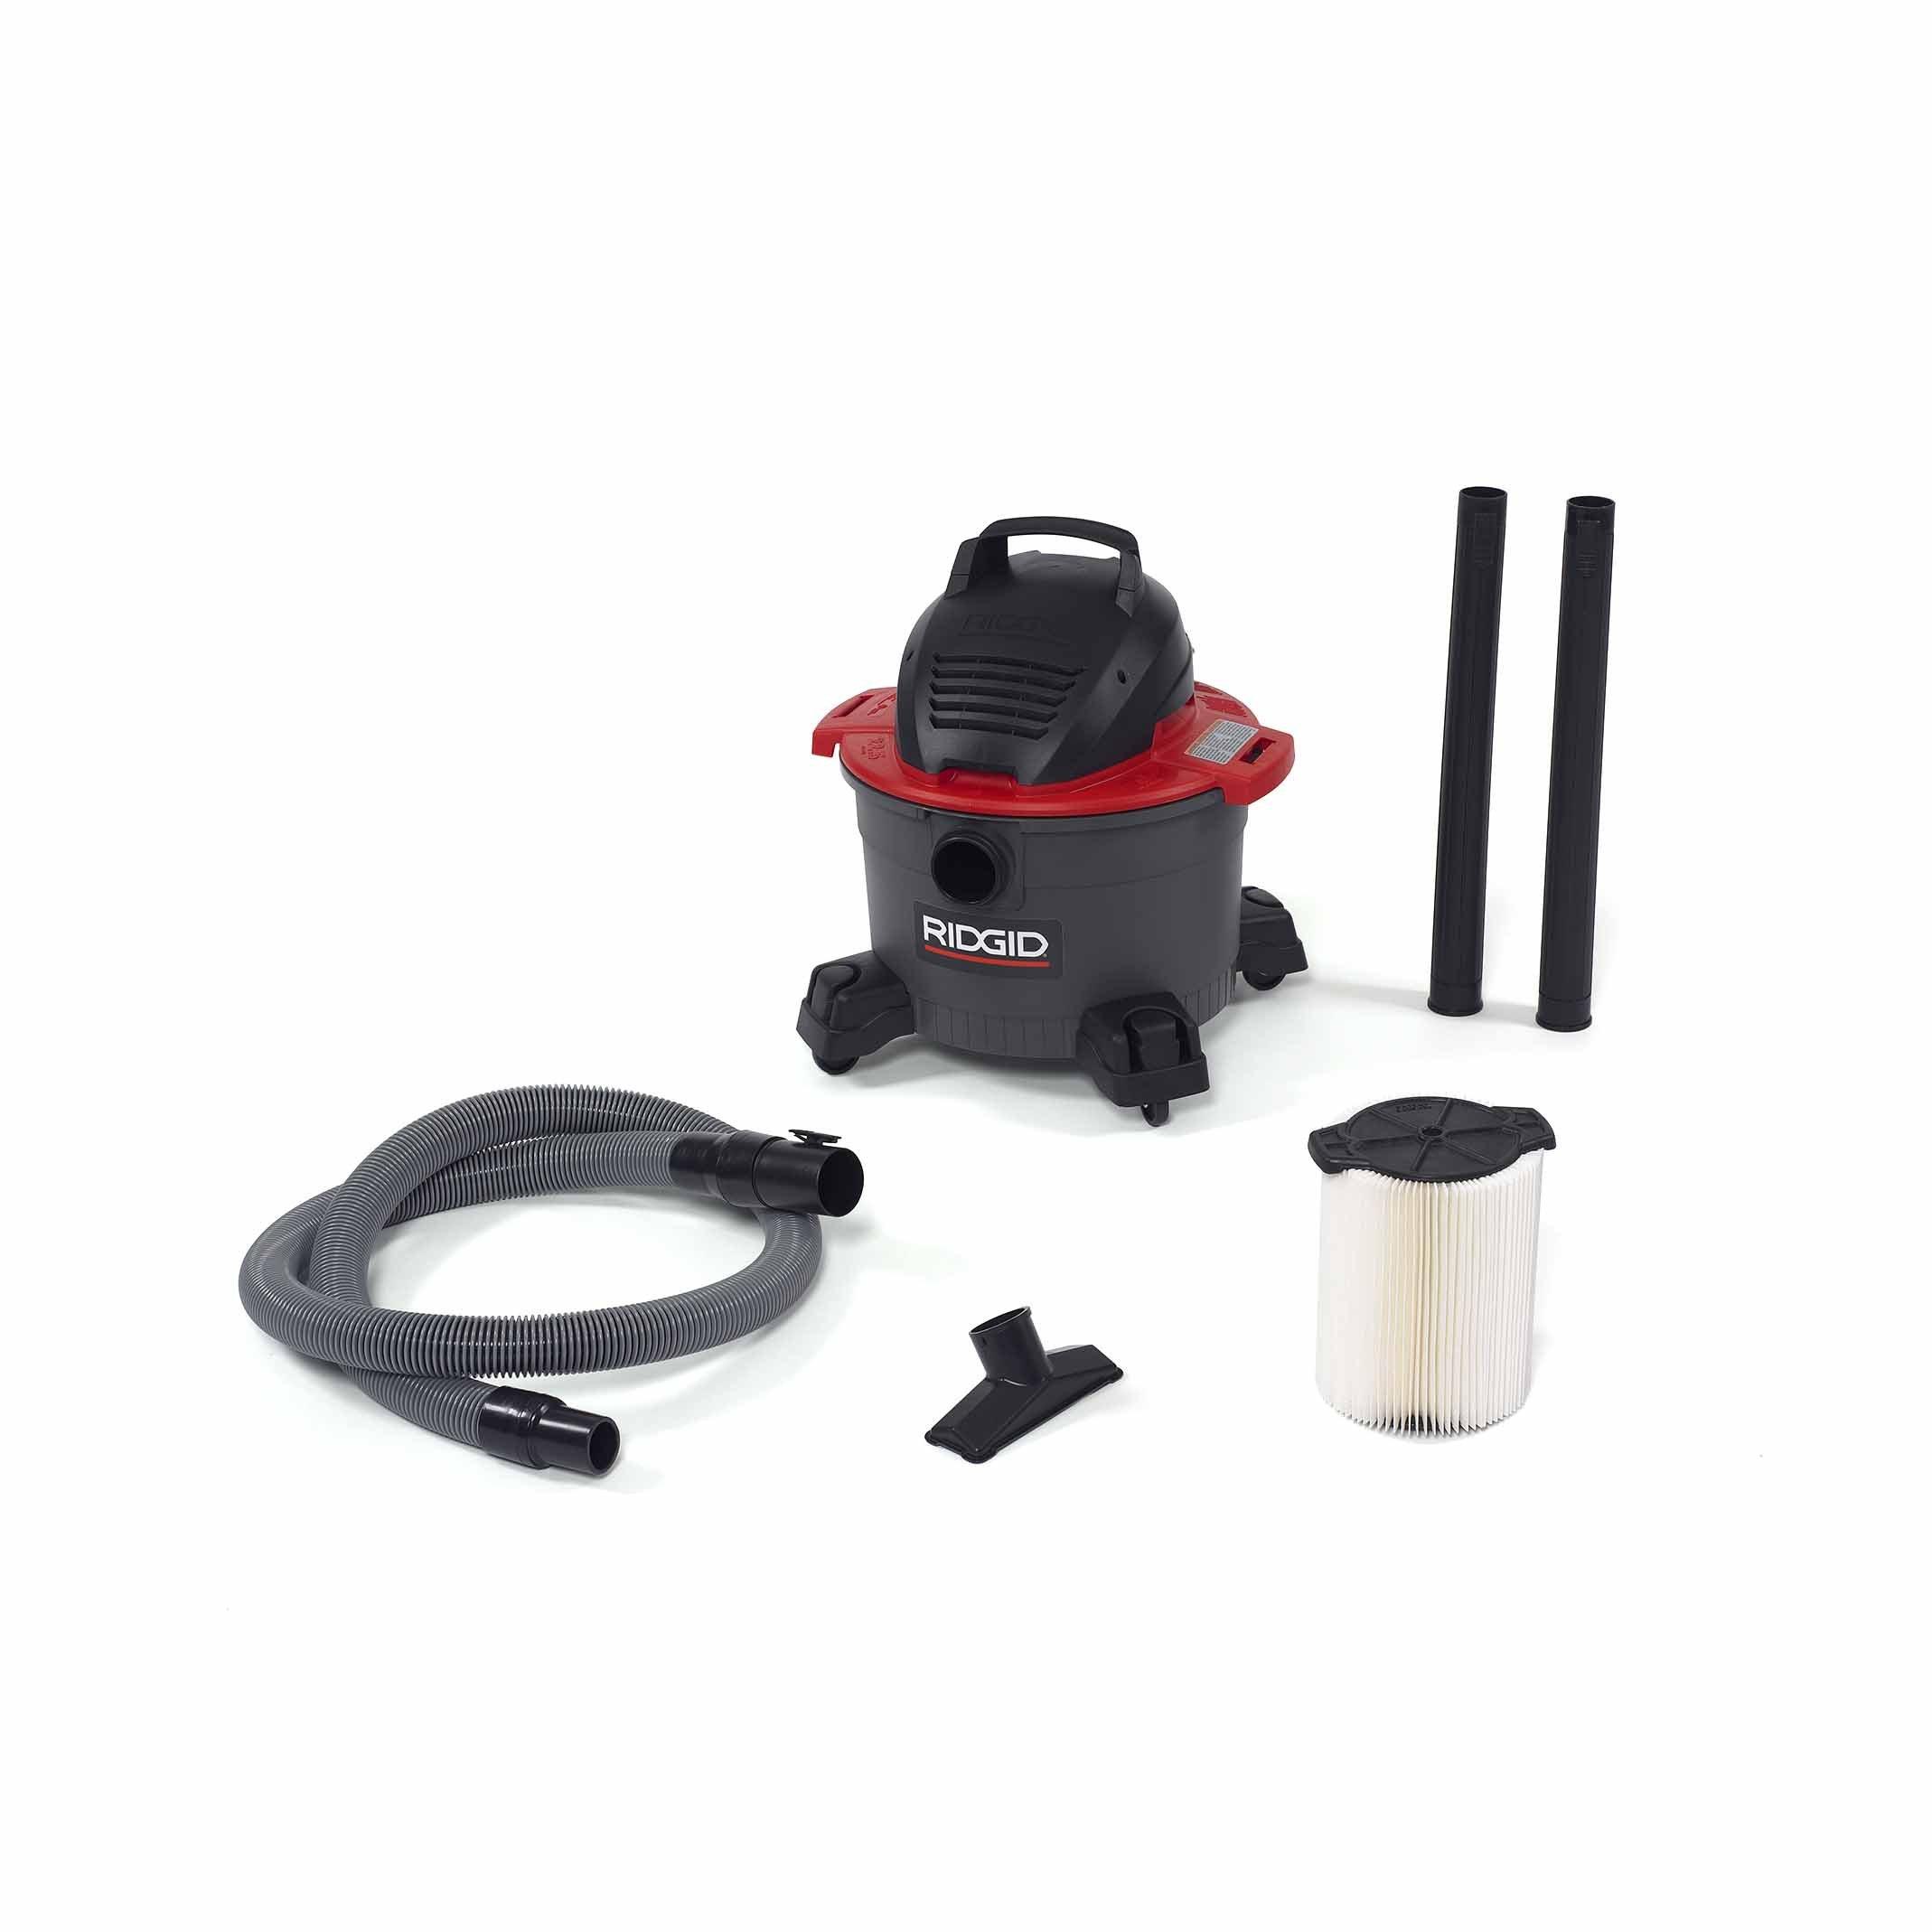 Ridgid 50308 6000RV Wet/Dry Vacuum, 6 gal, Red